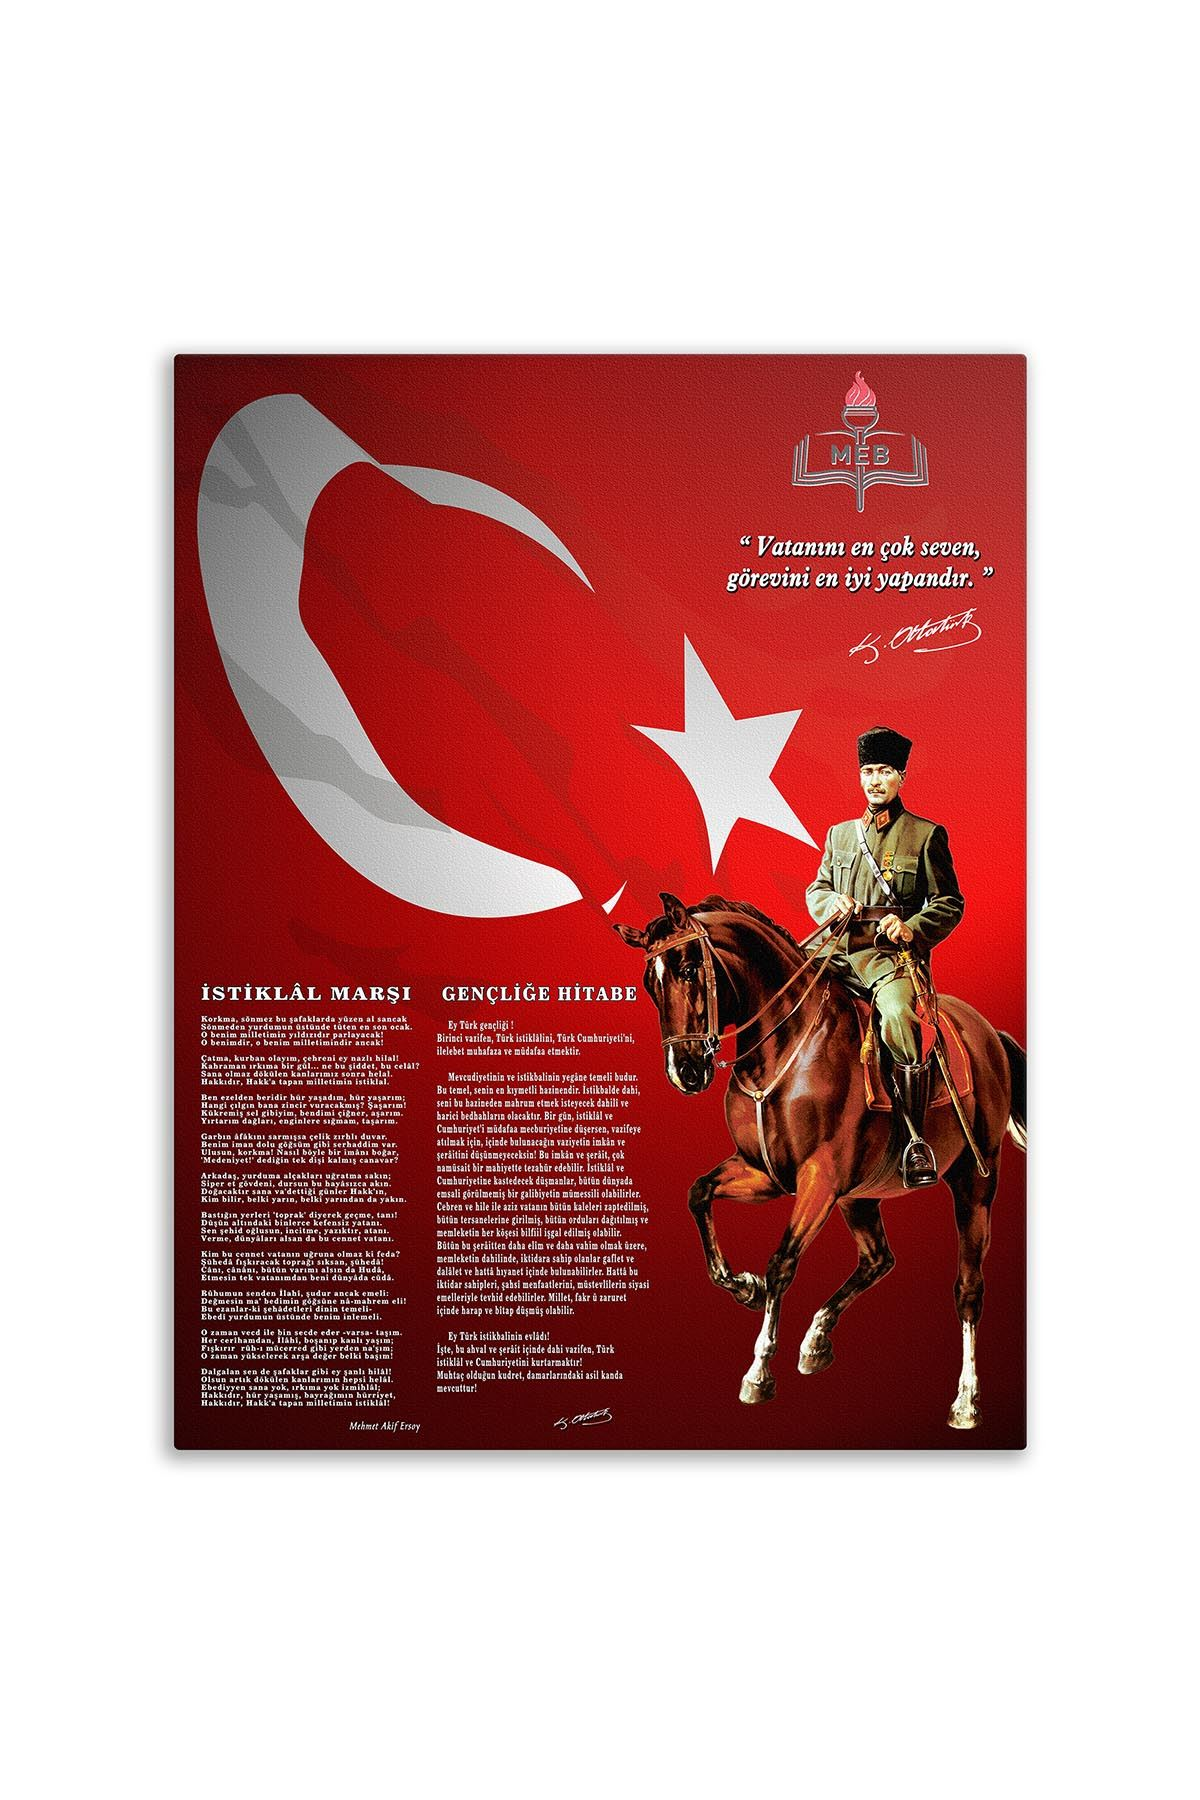 Cavalry Ataturk Canvas Board   Printed Canvas Board   Customized Canvas Board  Digital Printing